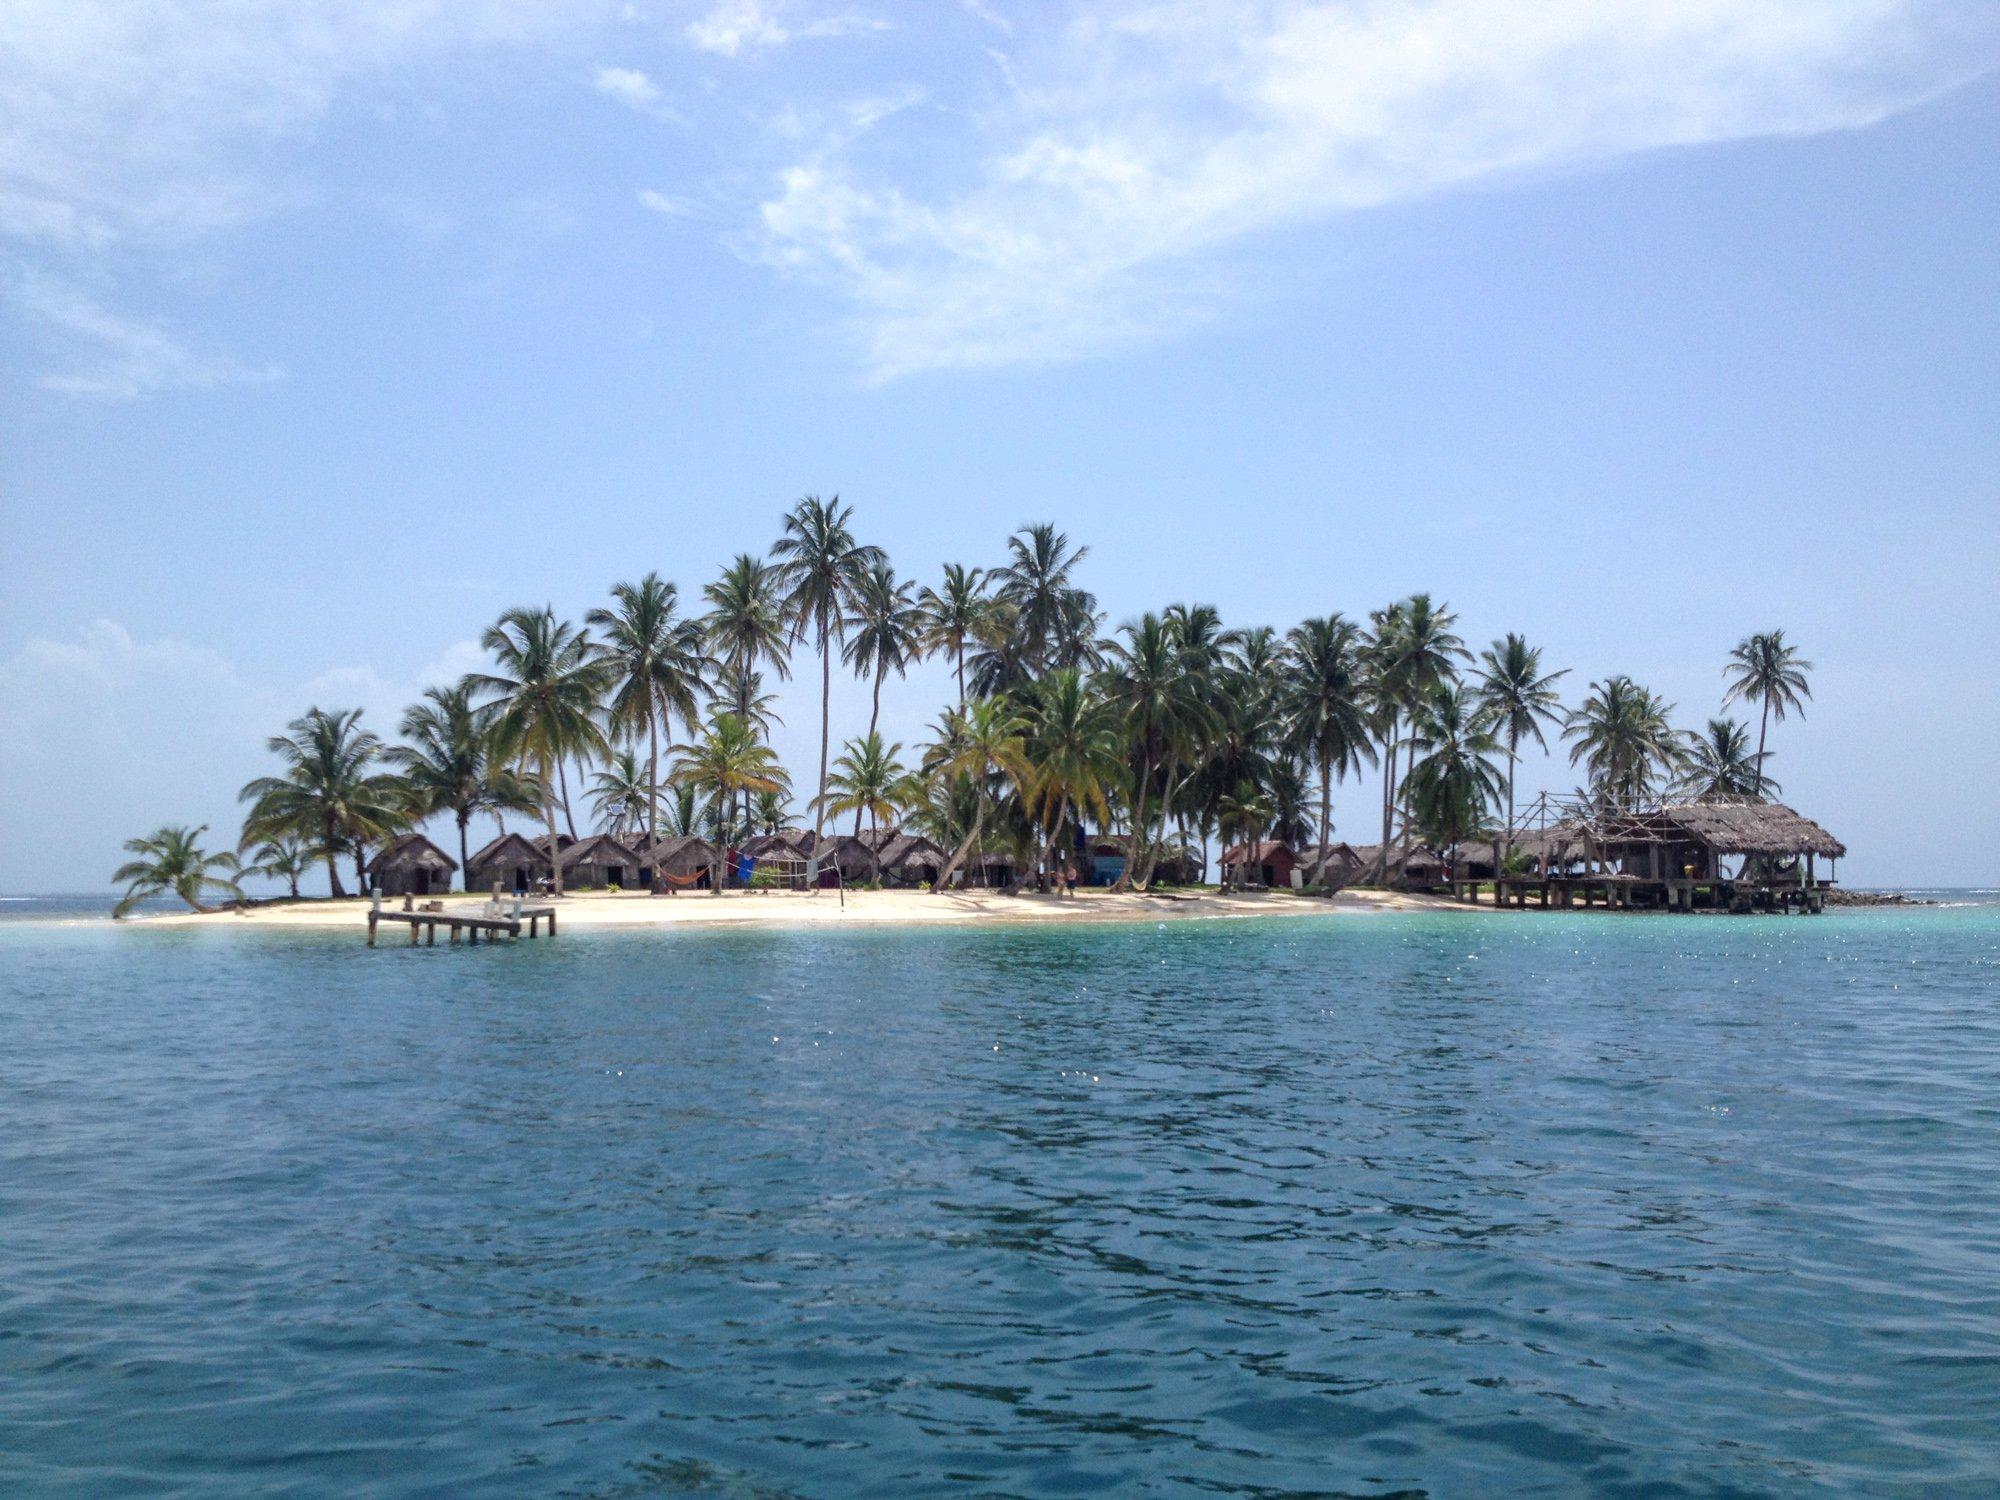 Kuanidup, one of the San Blas Islands in Panama